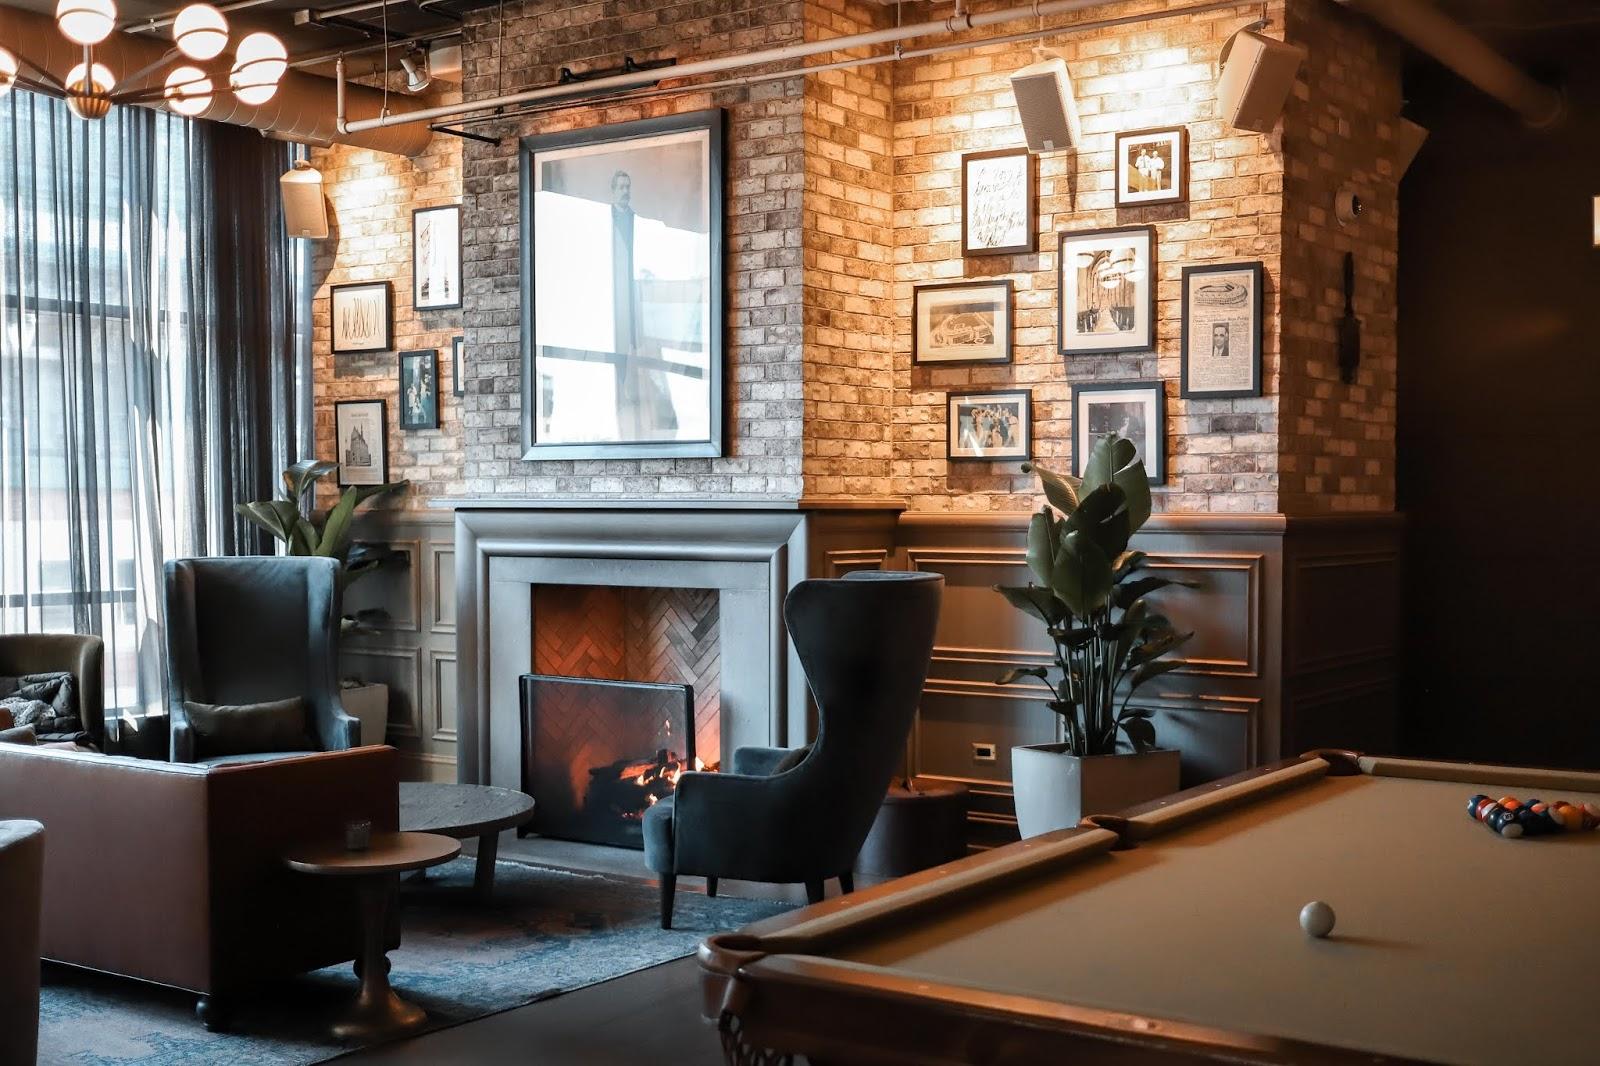 Hotel Zachary Fireplace